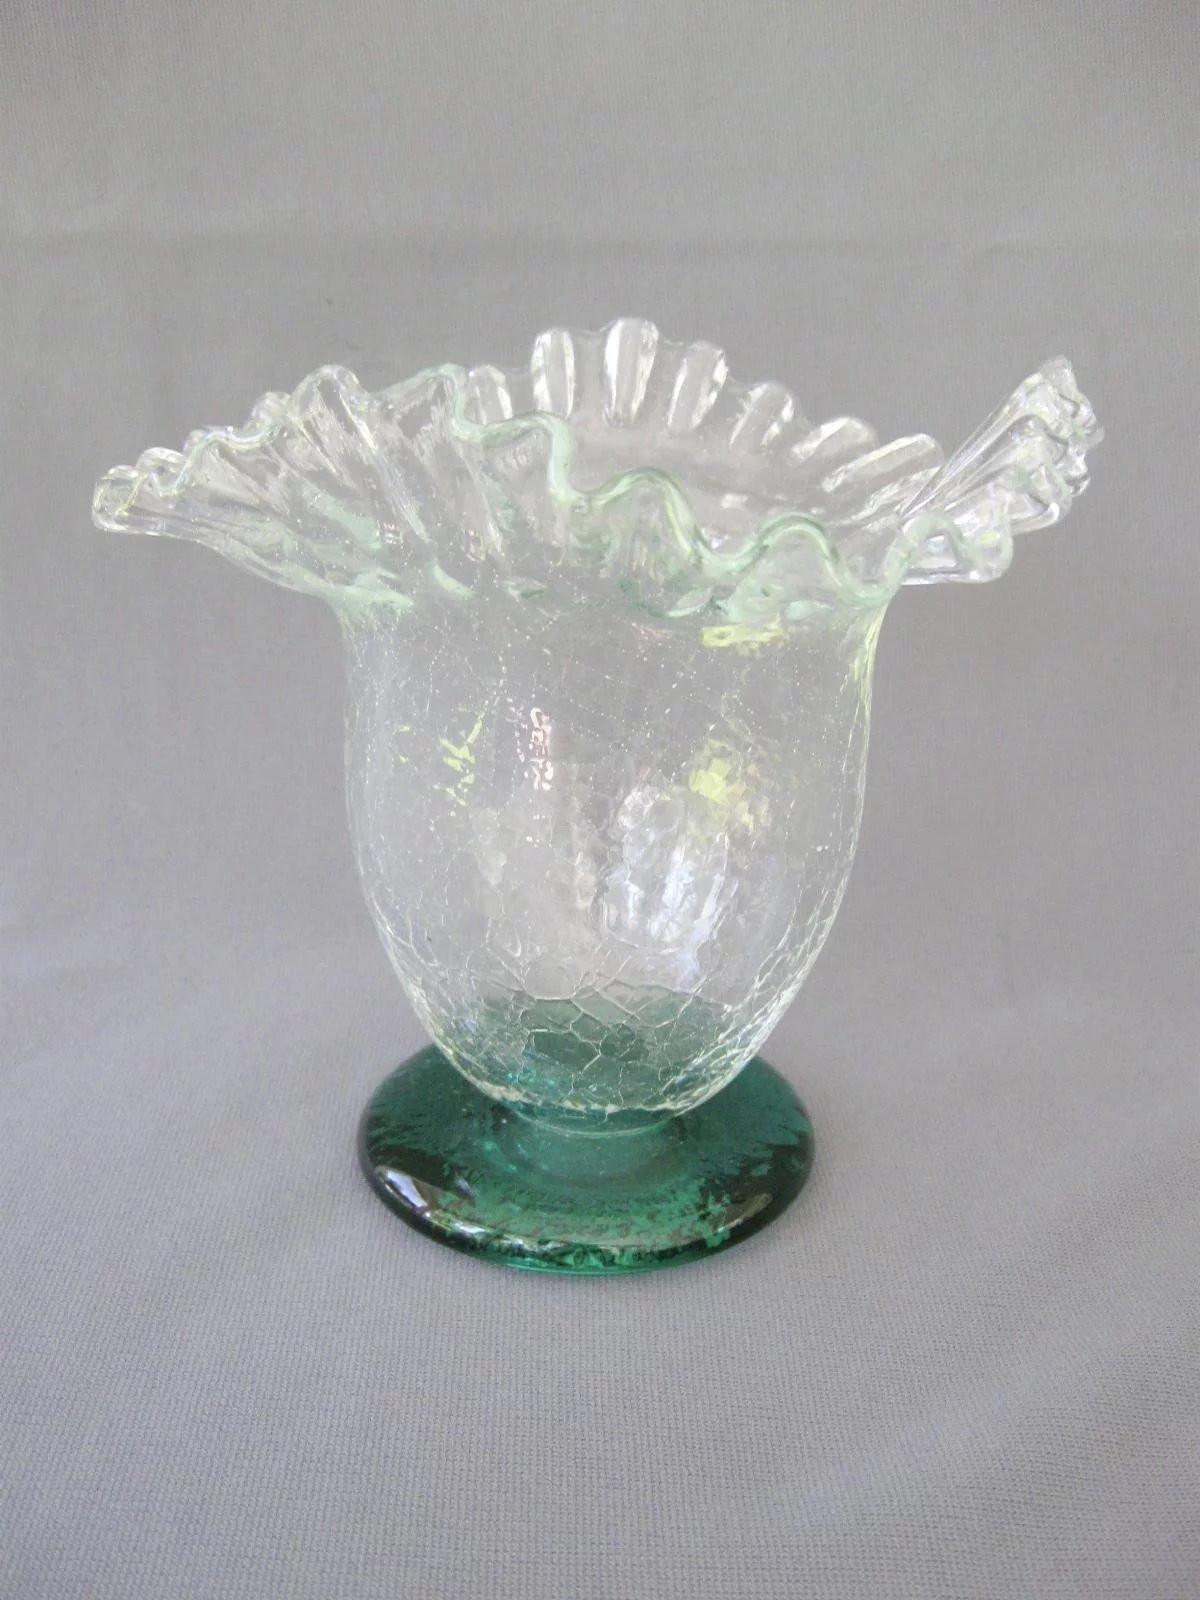 3 Feet Tall Vases Of 3 Foot Glass Vase Vase and Cellar Image Avorcor Com Regarding 3 Foot Gl Vase and Cellar Image Avorcor